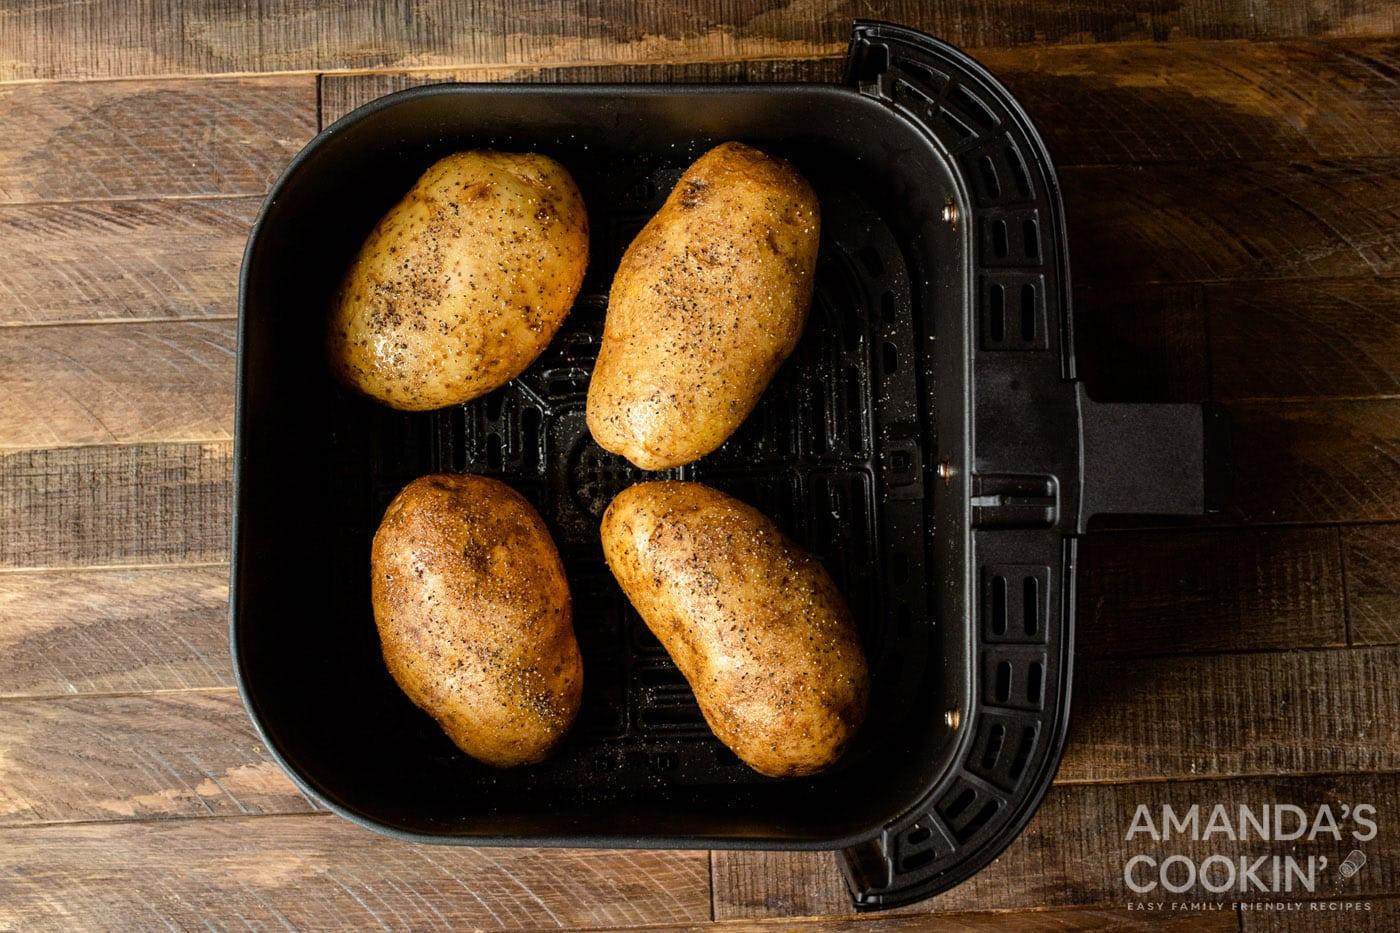 russet potatoes in air fryer basket